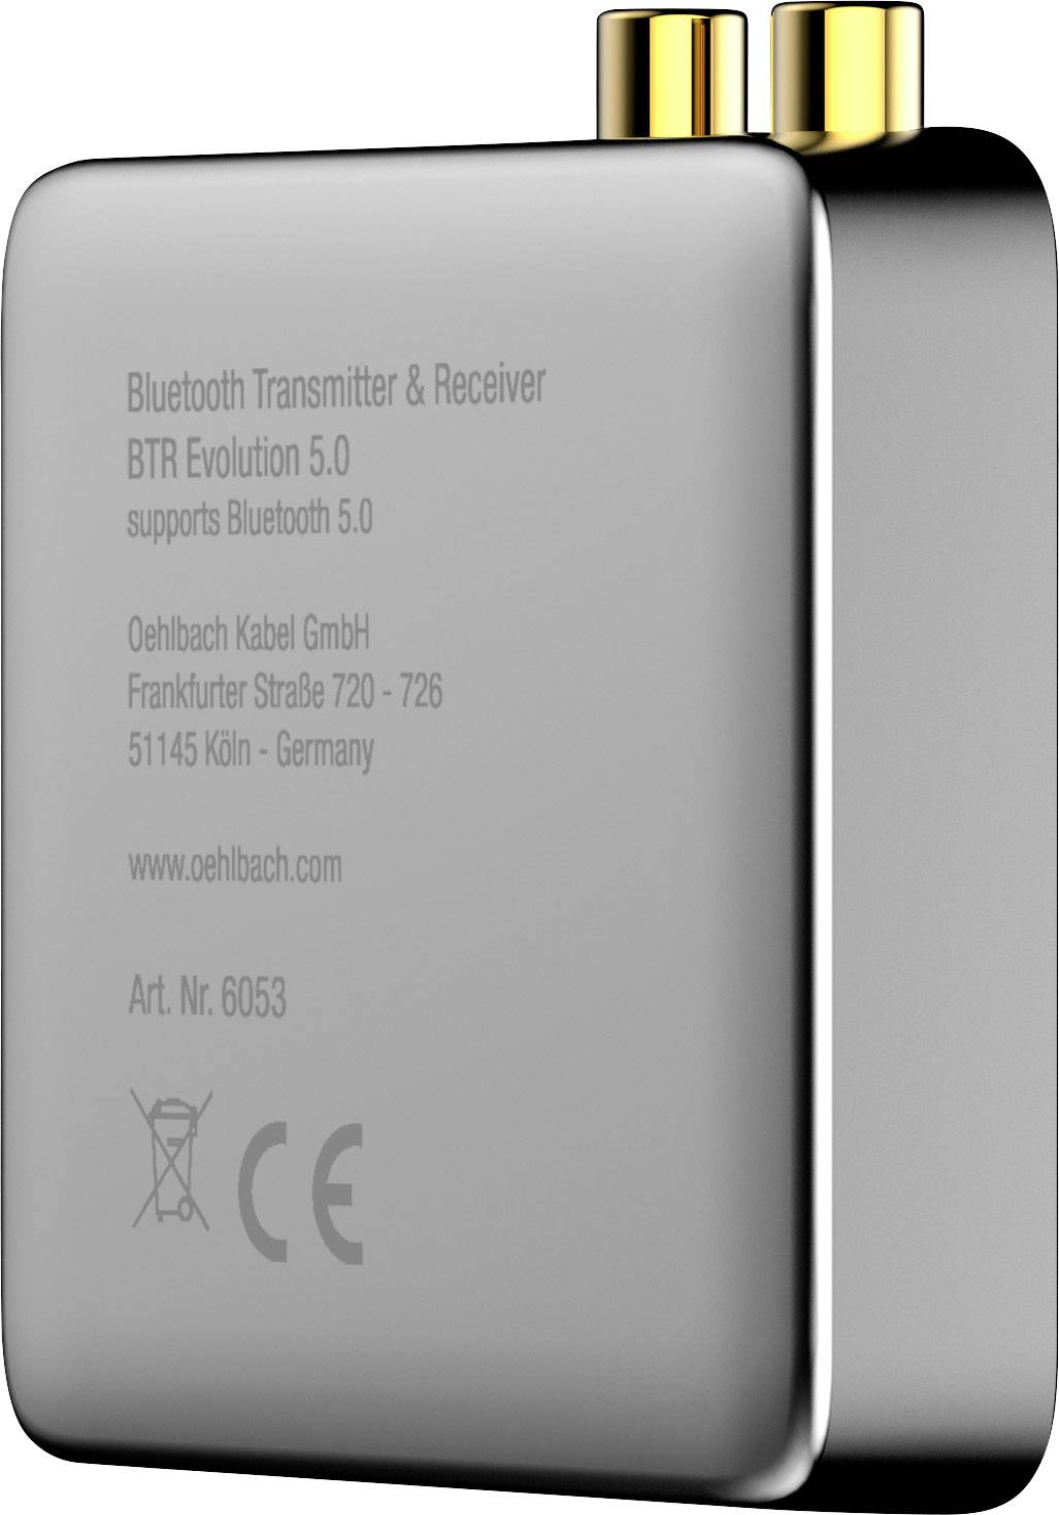 <br>  Oehlbach<br>  BTR Evolution 5.0<br>  Bluetooth® glasbeni oddajnik/sprejemnik<br>  Bluetooth: 5.0<br>  Domet (maks.